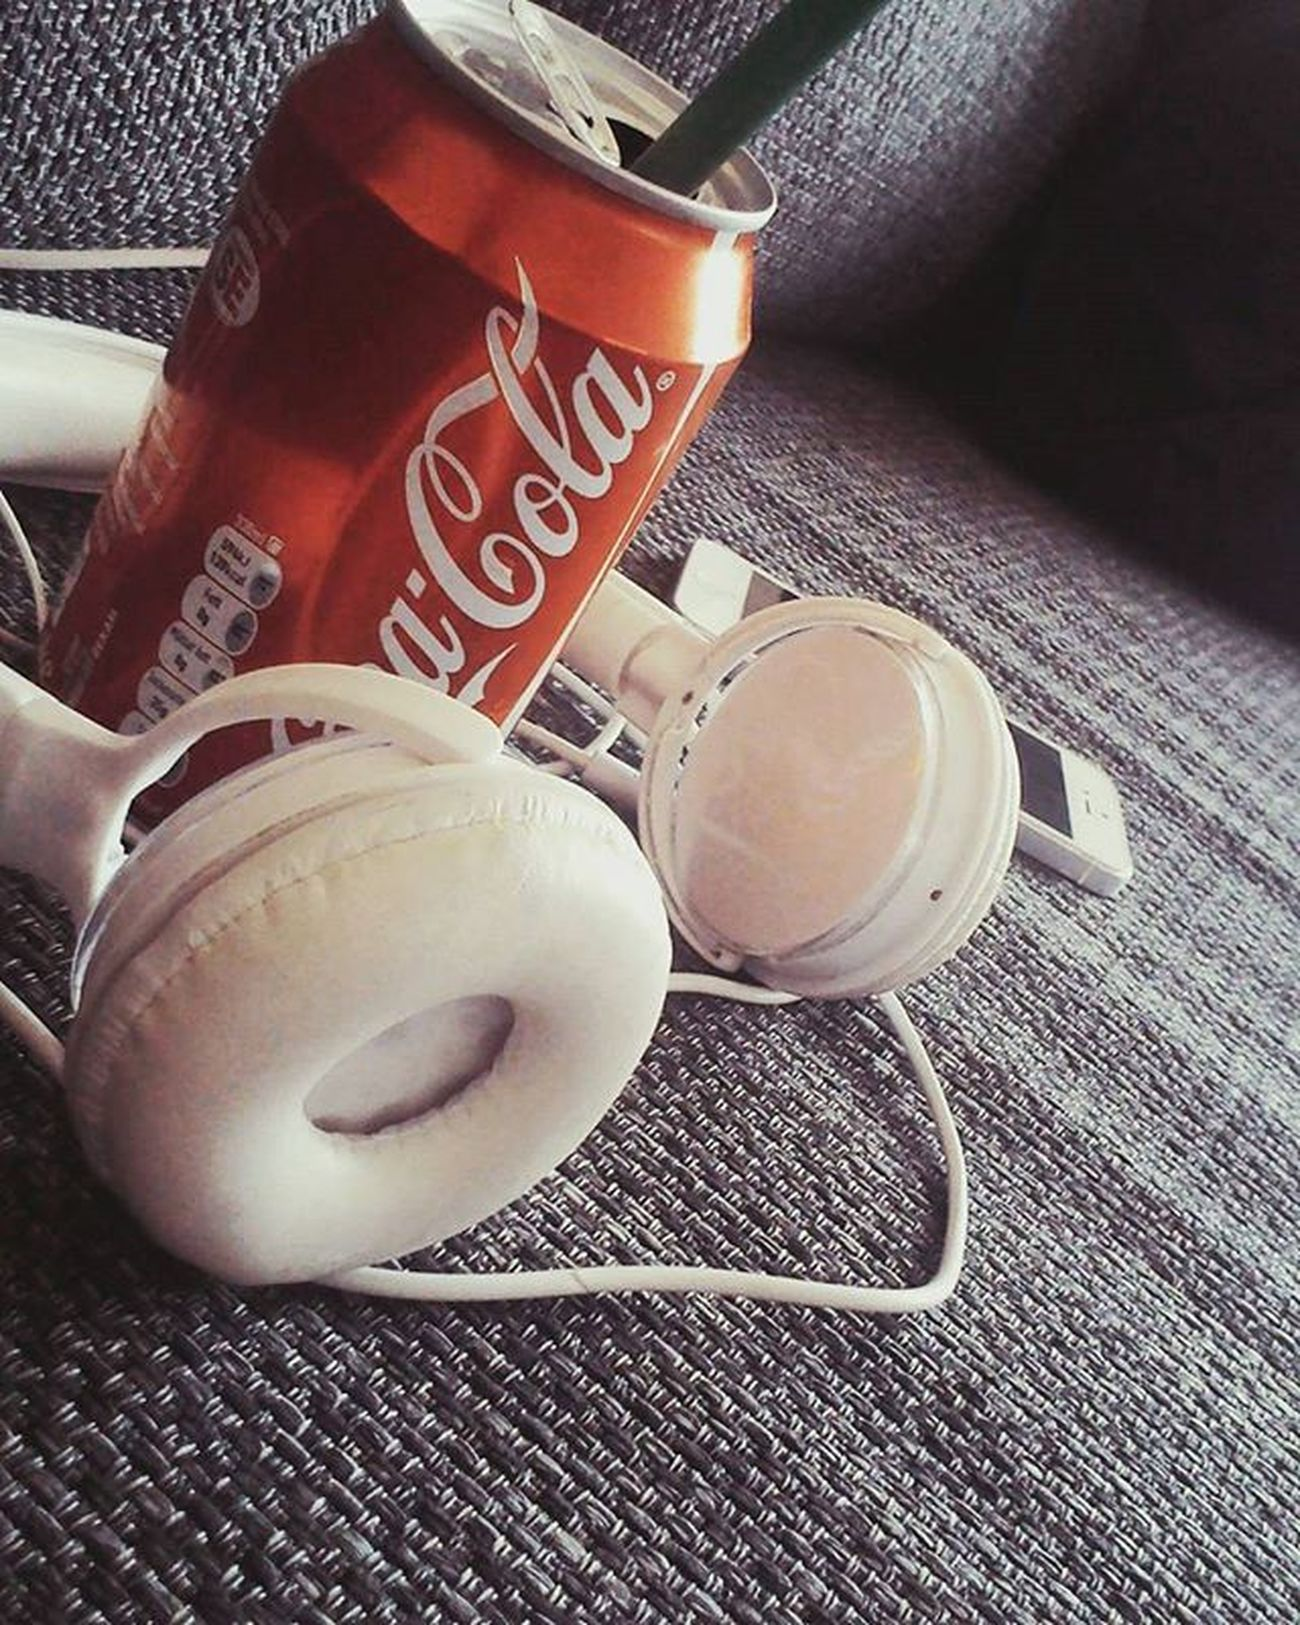 Cocacolalover Iphone5s Whiteis Headphones Listeningtomusic Drinkcocacolainbottles